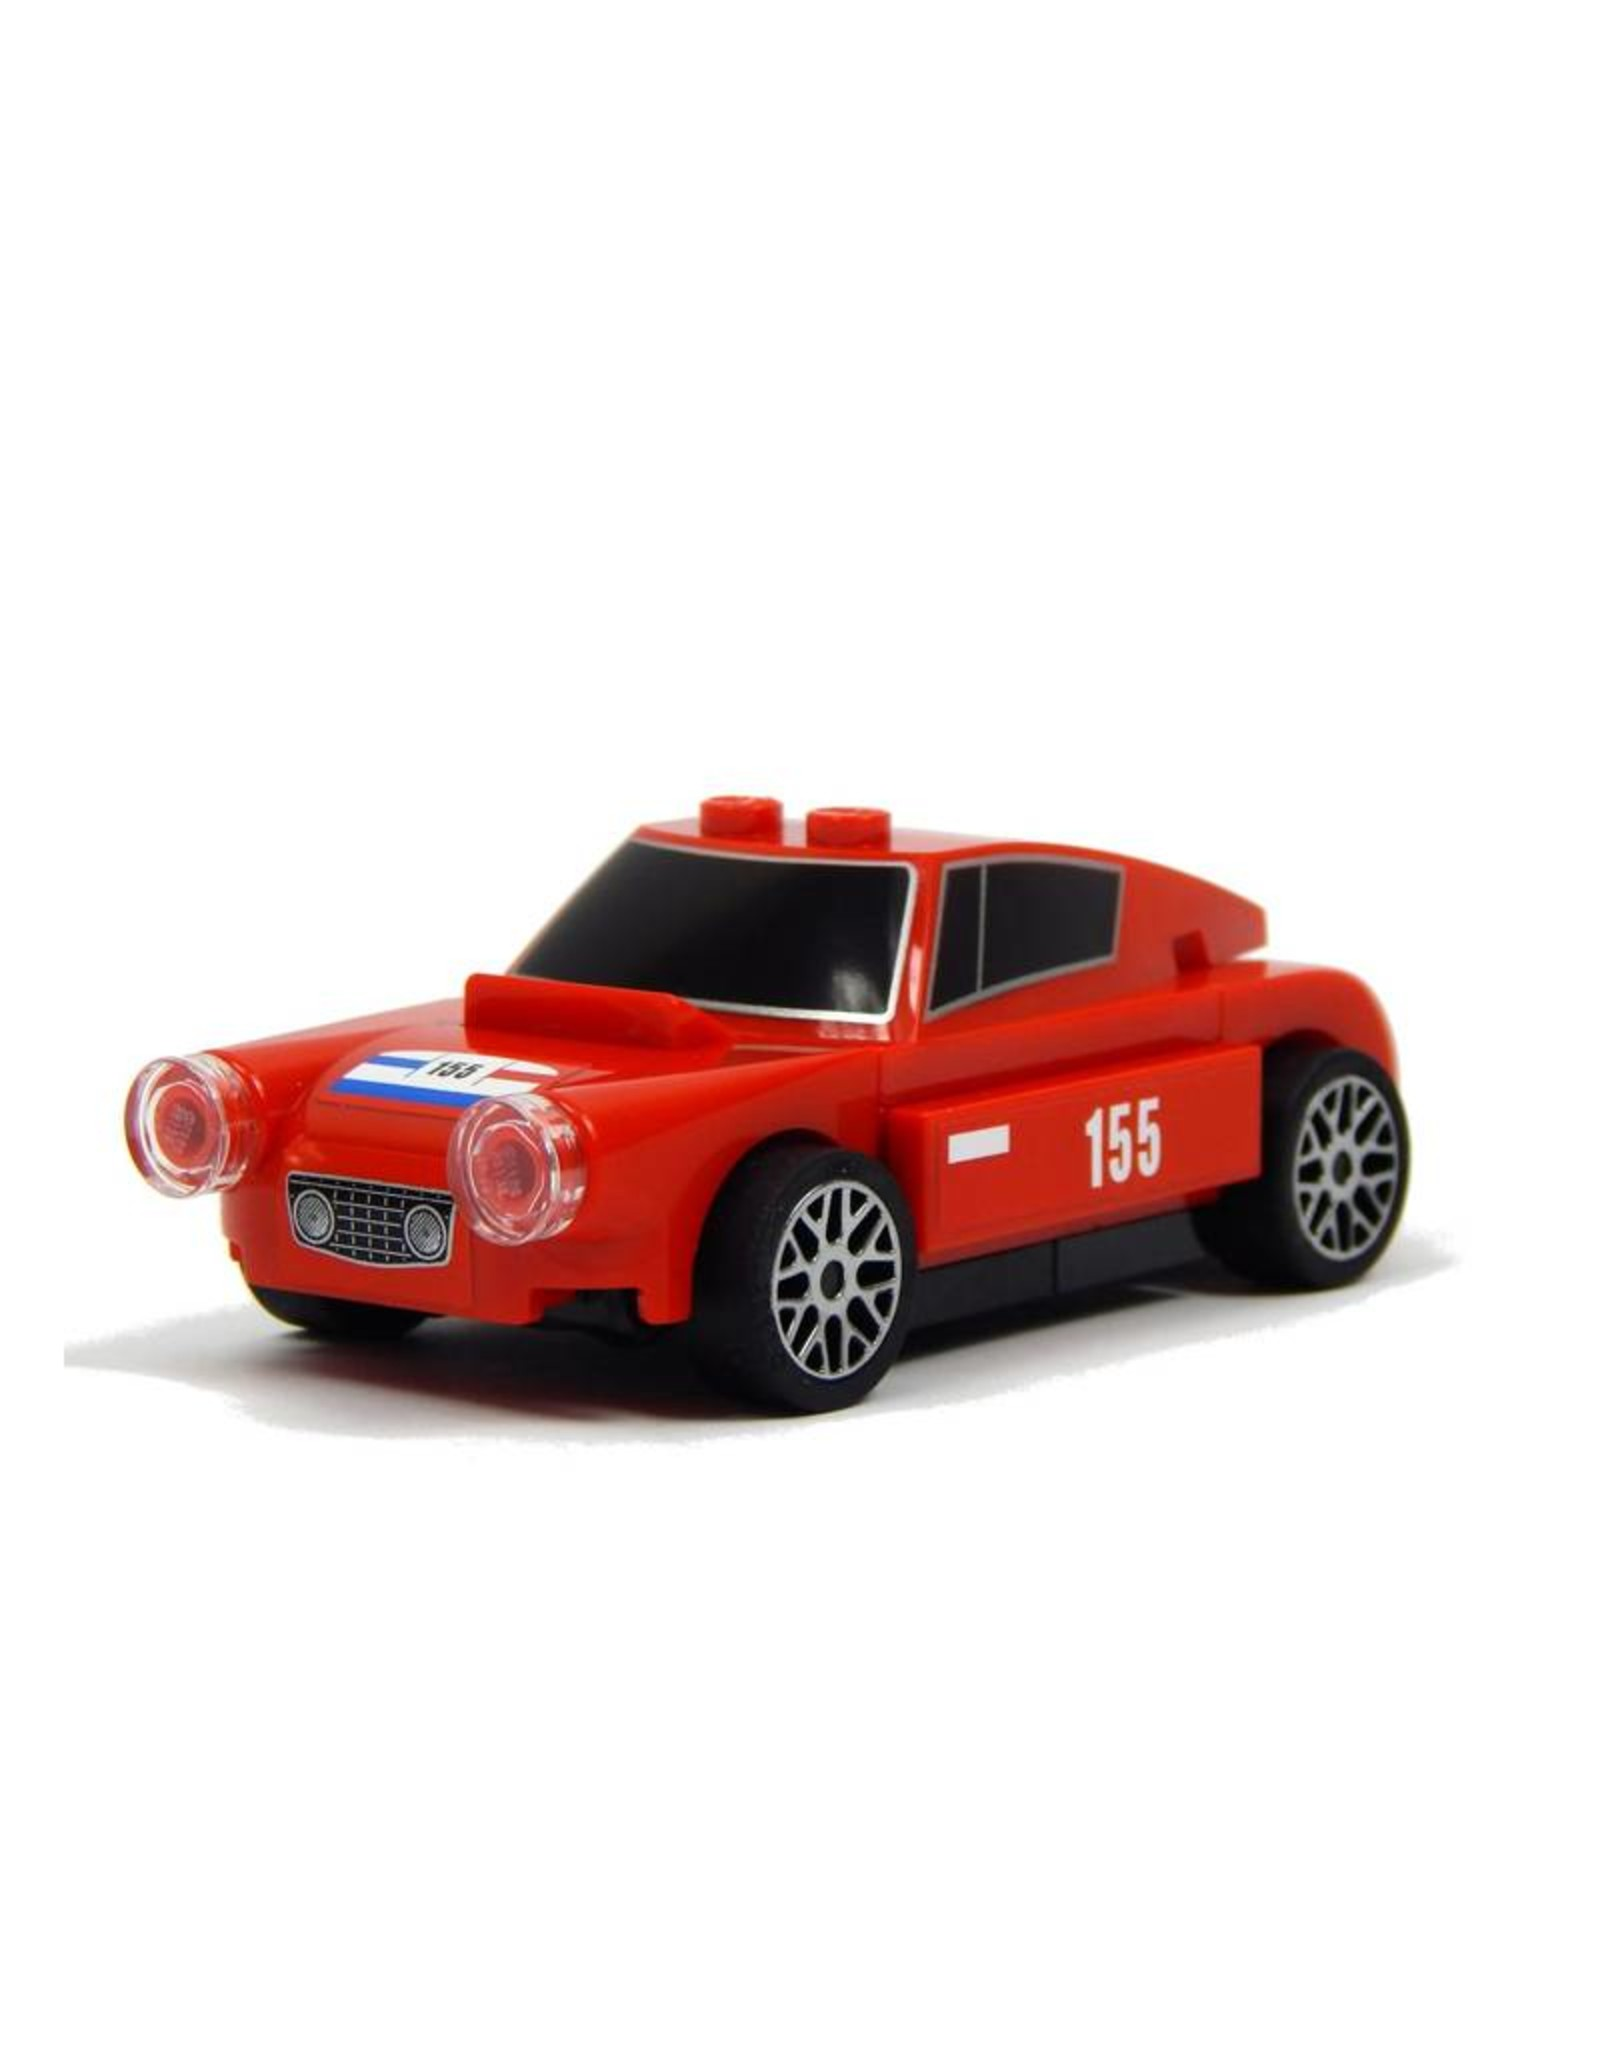 LEGO LEGO 30193 250 GT Berlinetta V-POWER